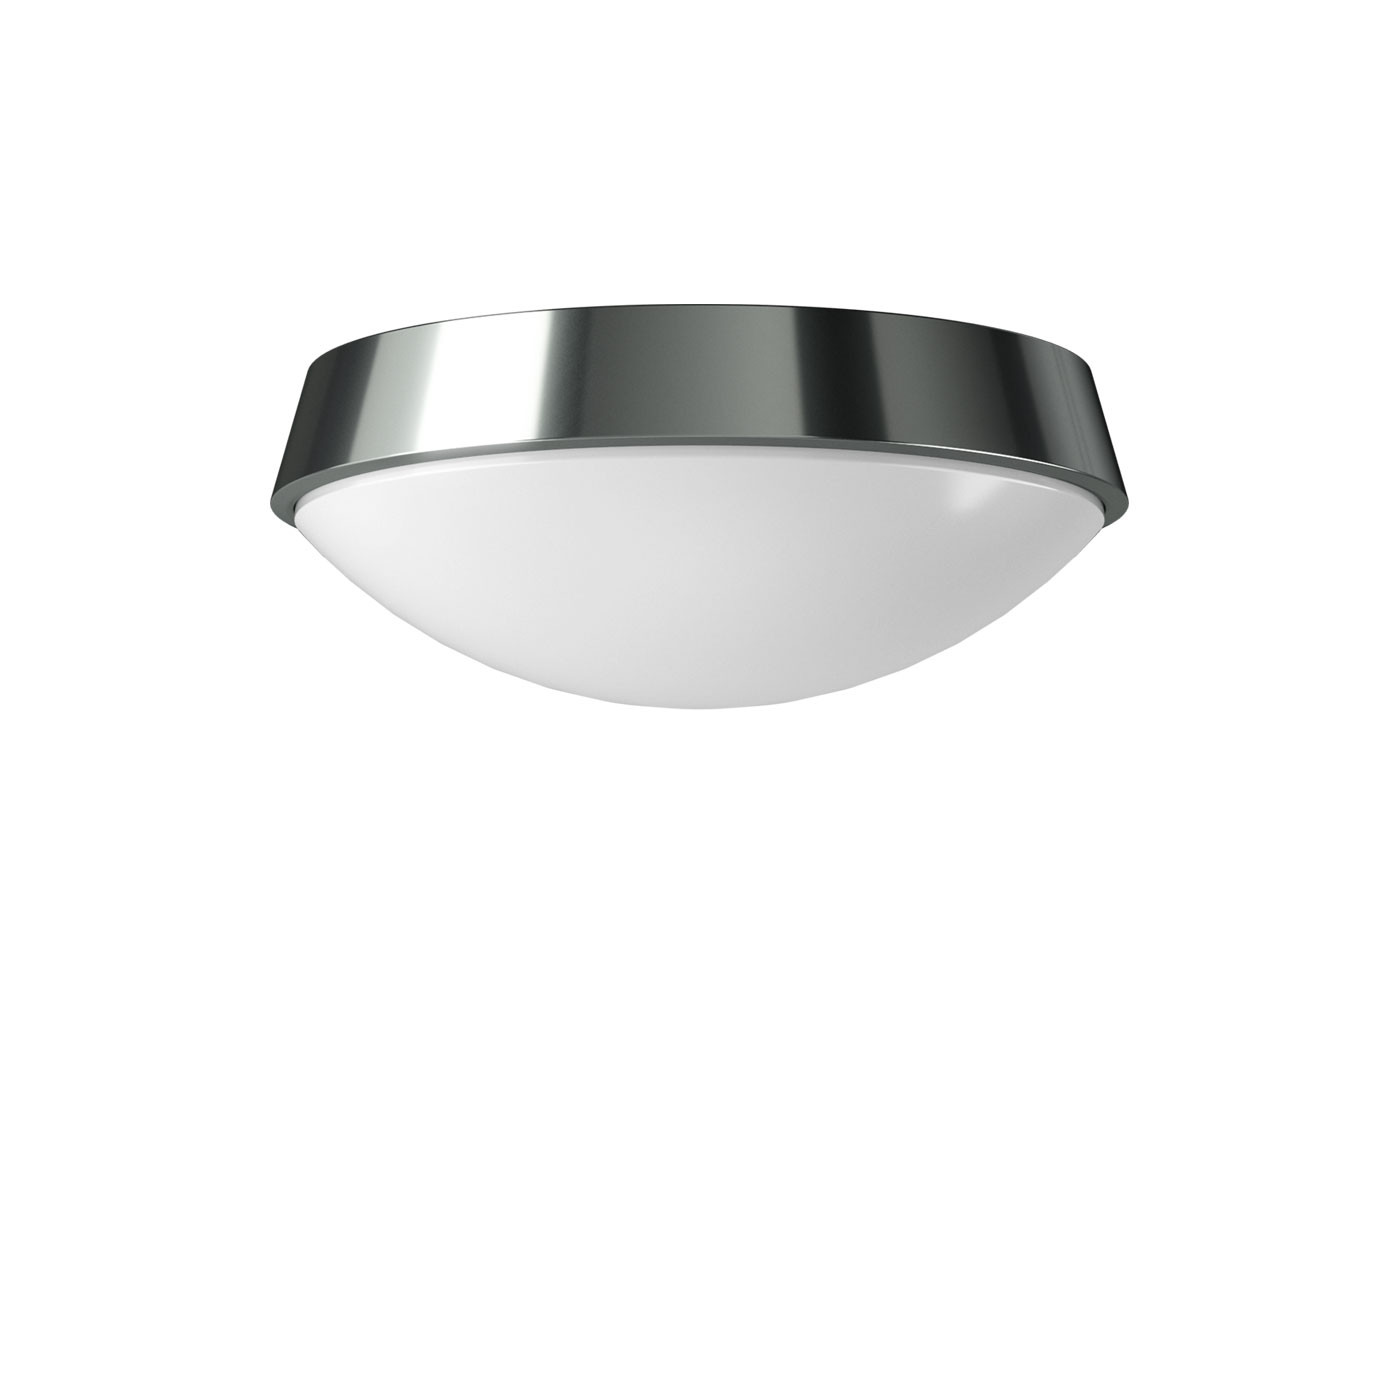 Bega 23100.3 / 23101.3 / 23102.3 / 23103.3 applique murale ou plafonnier LED, aluminium brillant